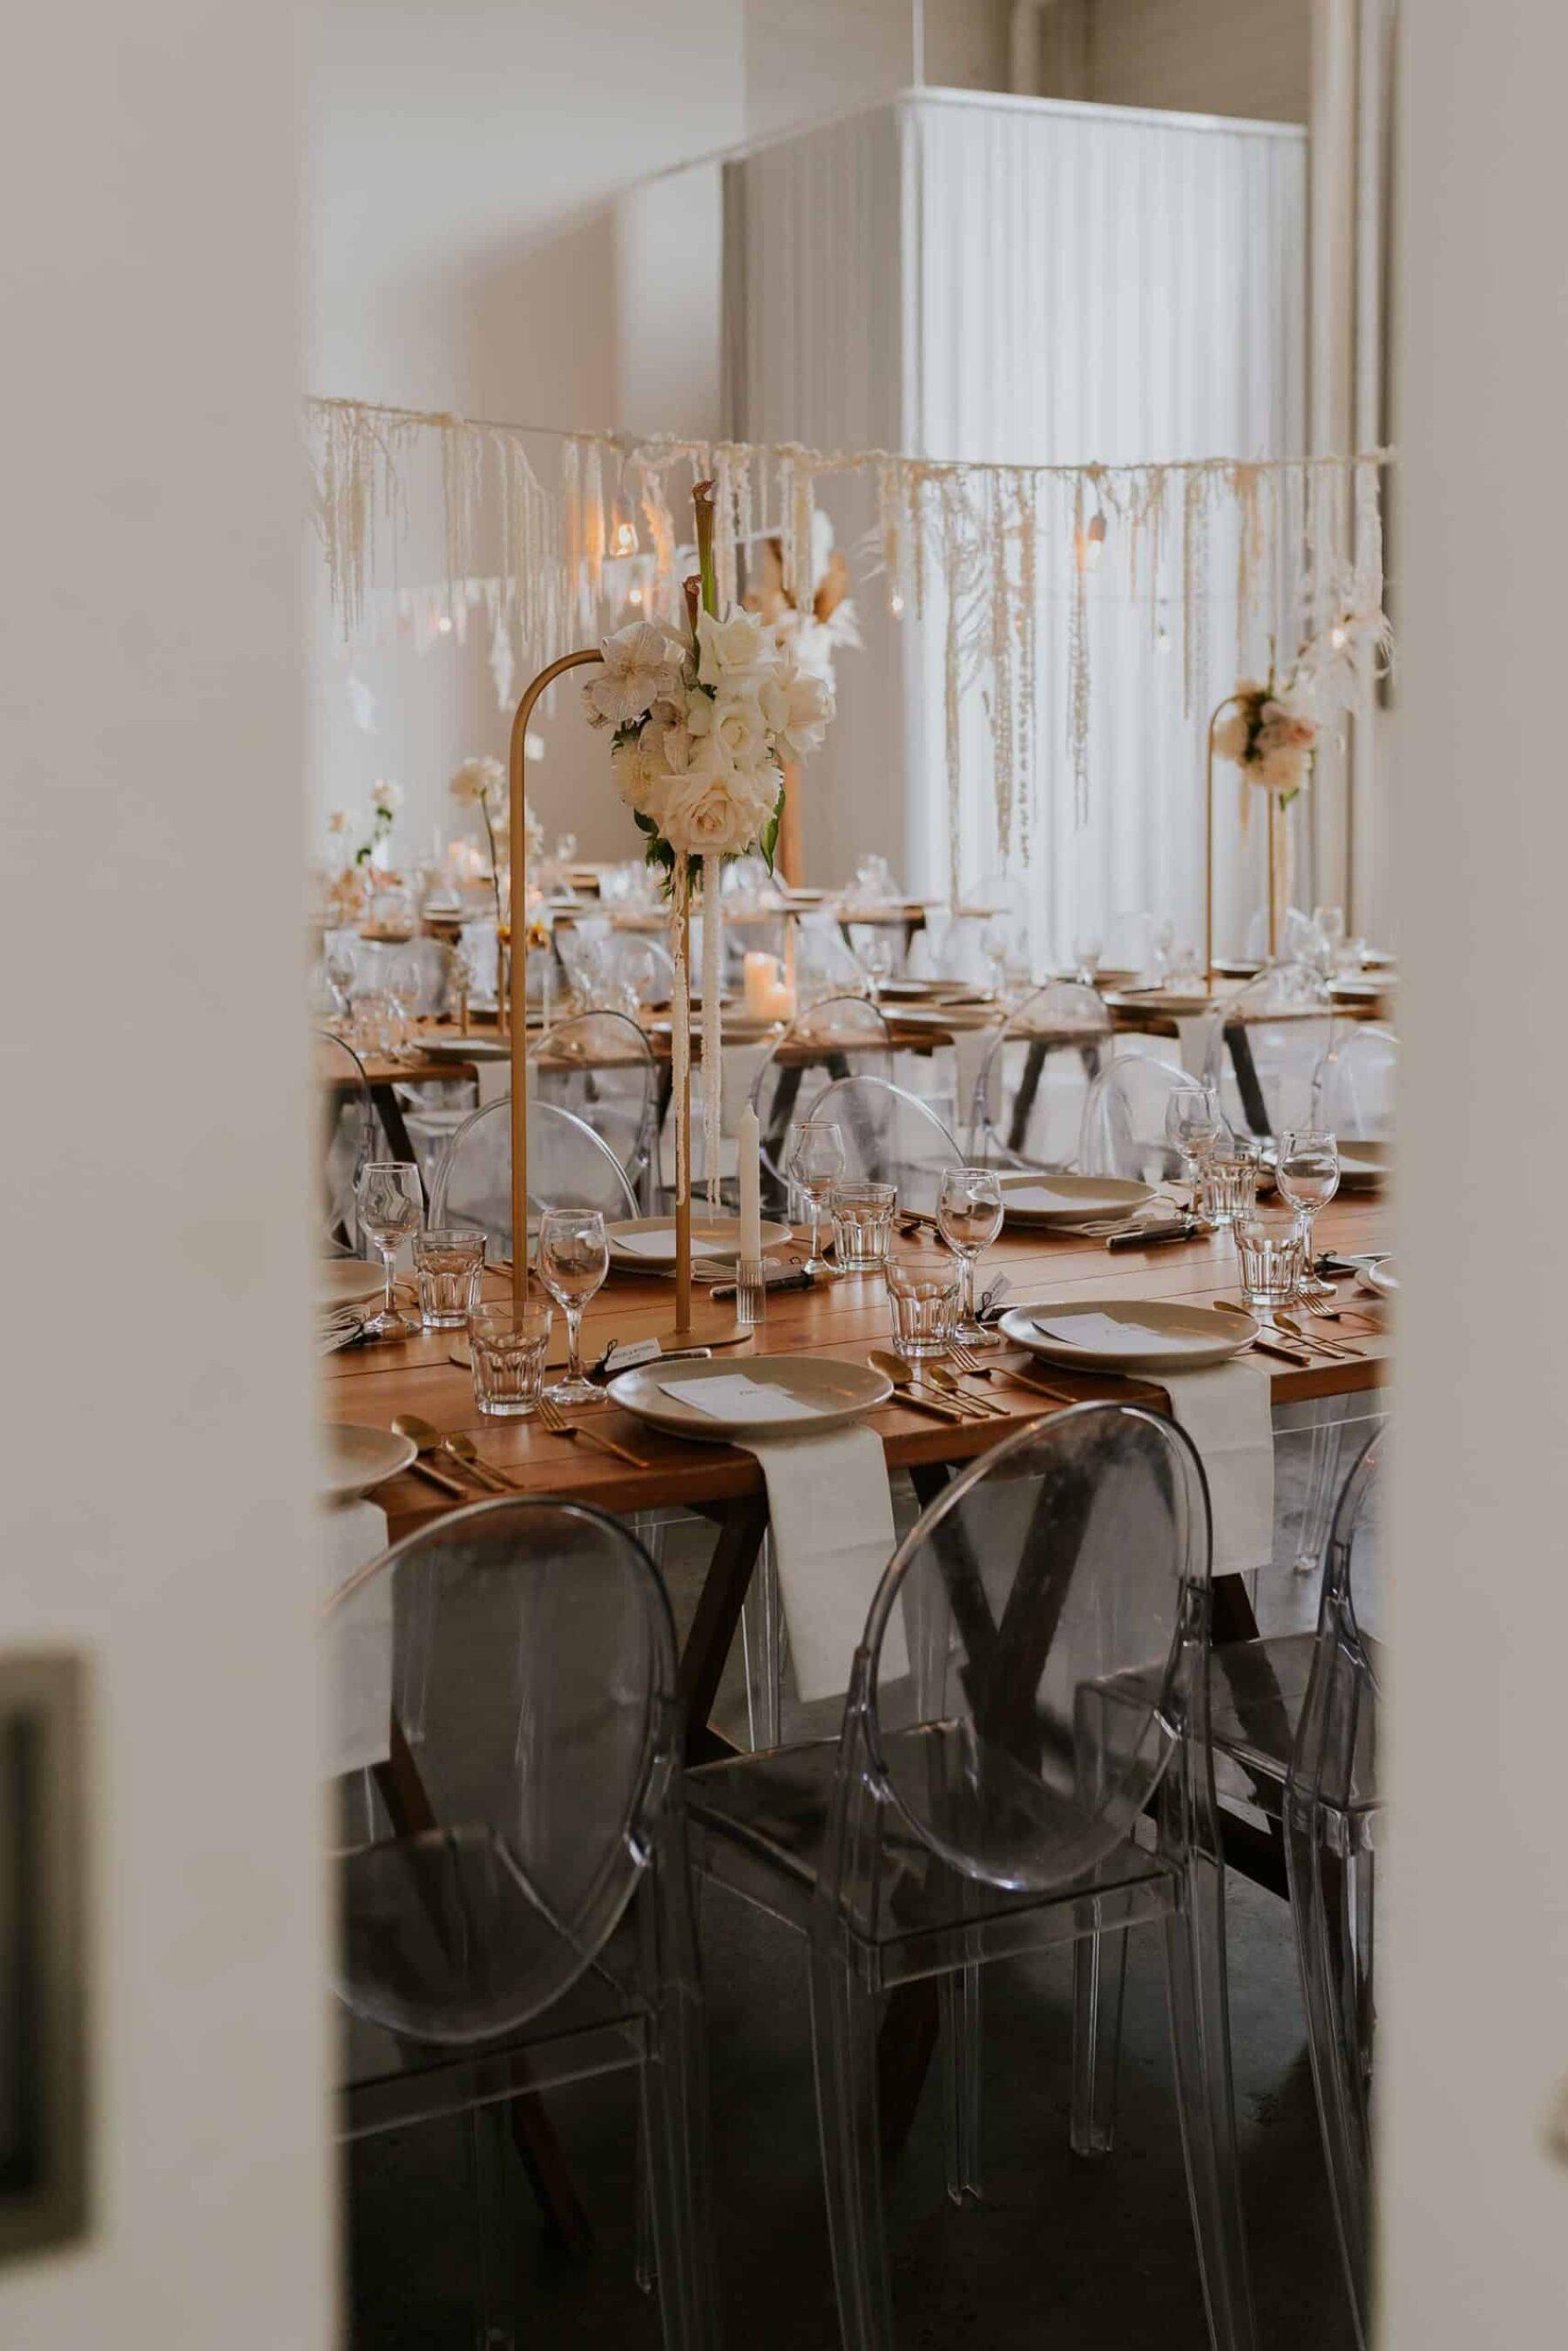 creative Sydney wedding stylist/planner - Upside Down Events